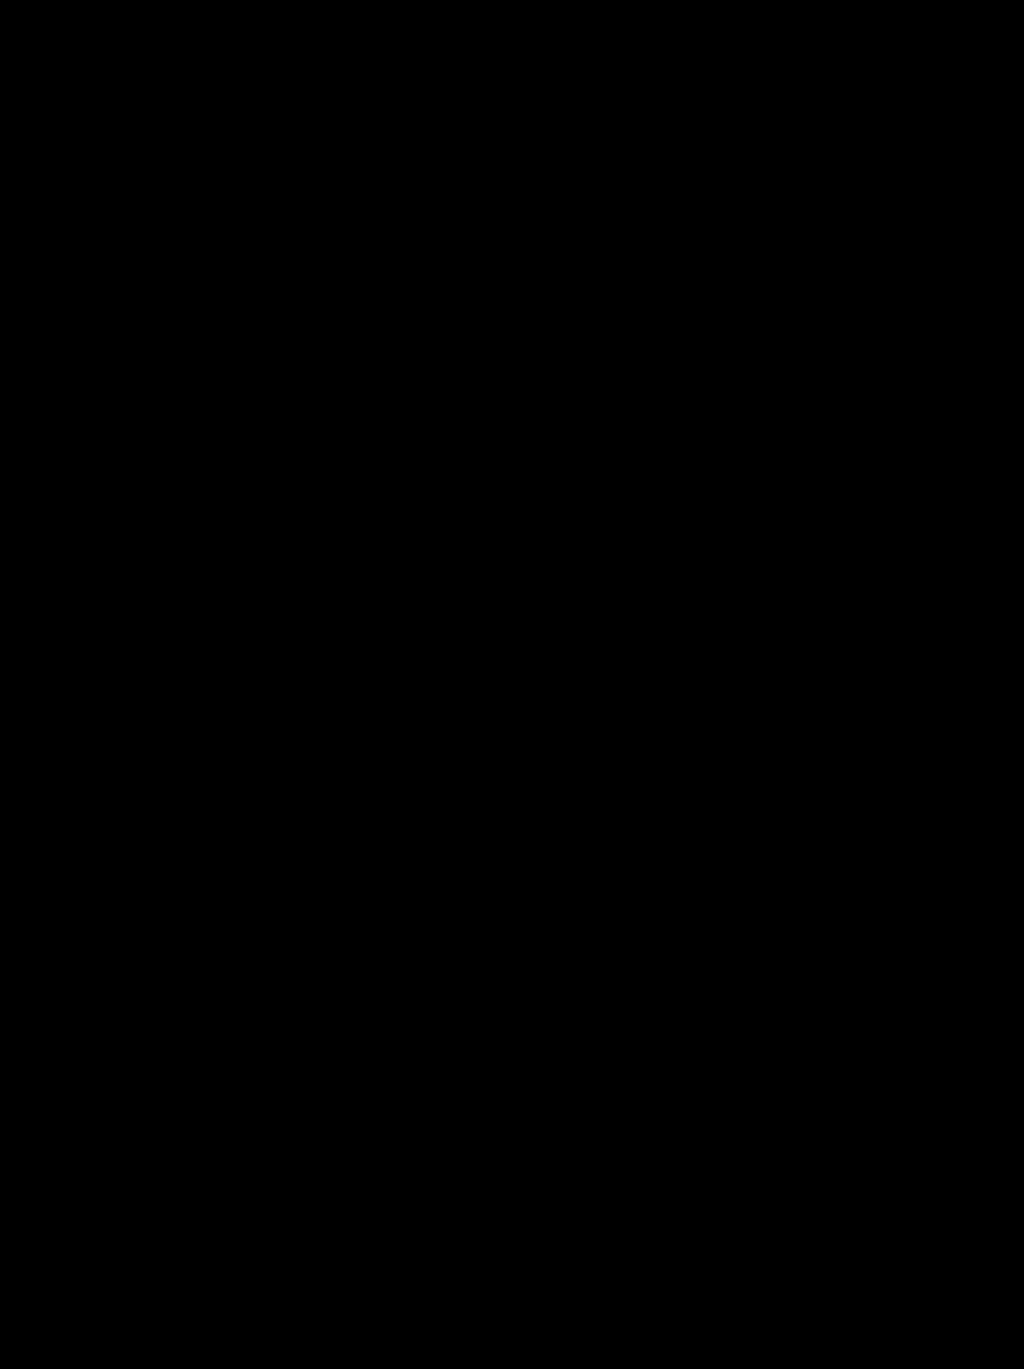 Arrows Arrow Symbol Symbols Grunge Grungeeffect Black